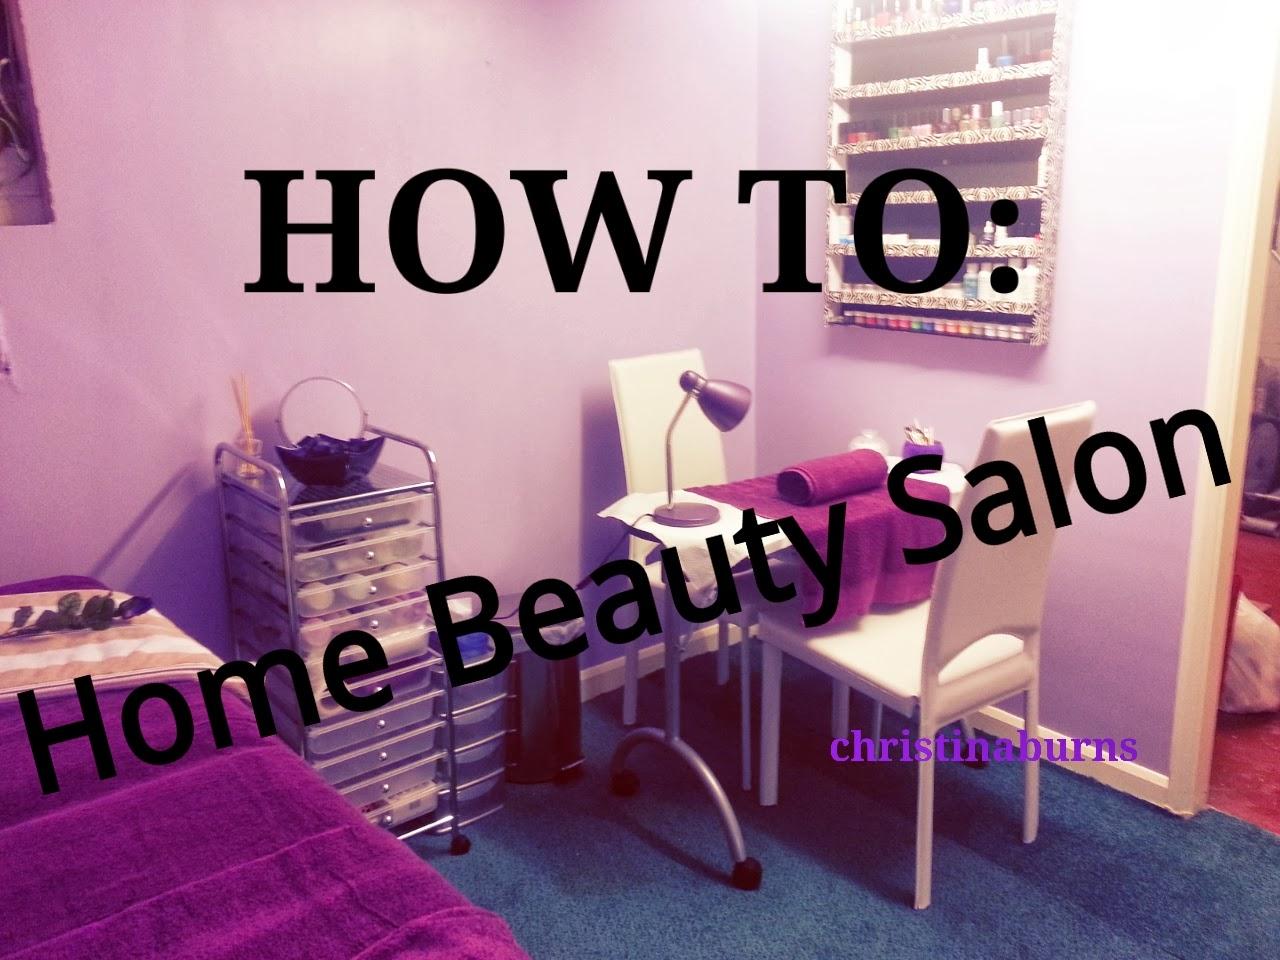 Home Spa Design Ideas: Beauty By Christina: How To: Decorate A Home Beauty Salon